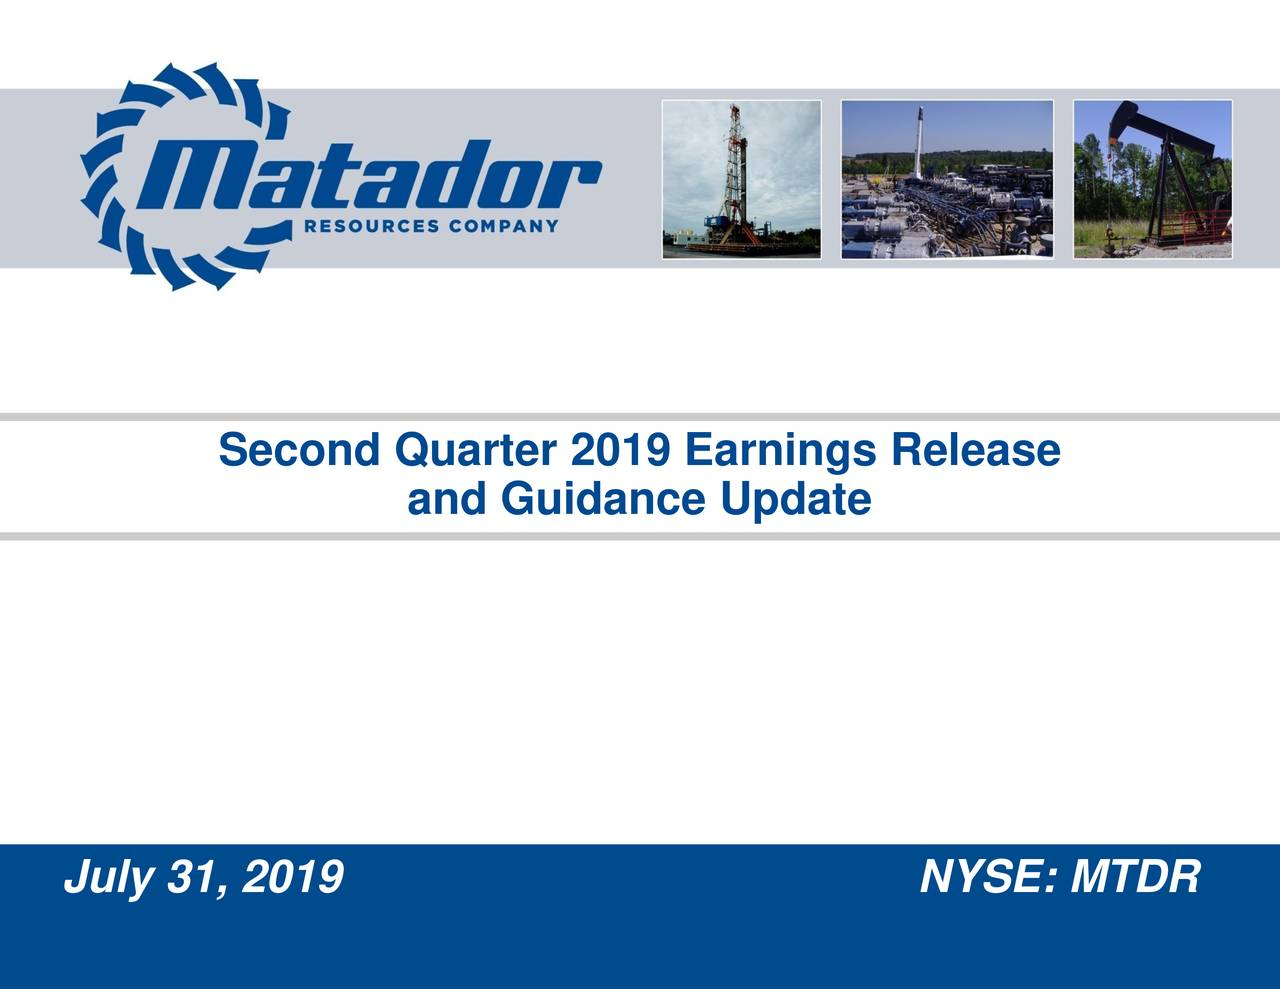 Second Quarter 2019 Earnings Release